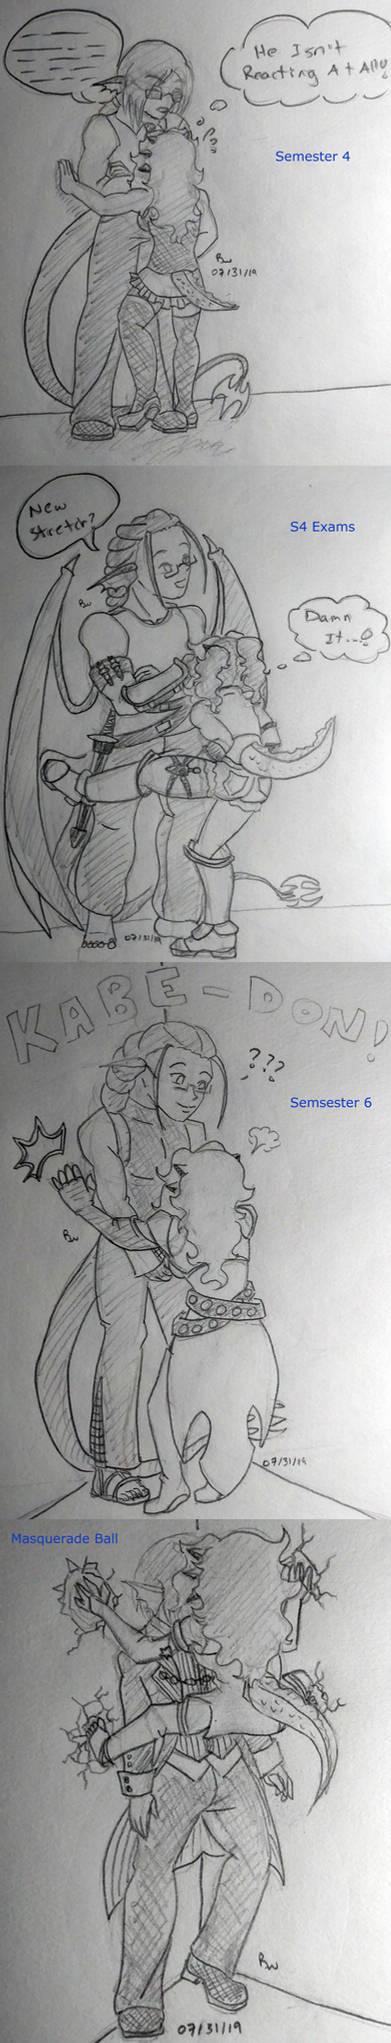 AoH - meme - DracoLen - Kabe-don